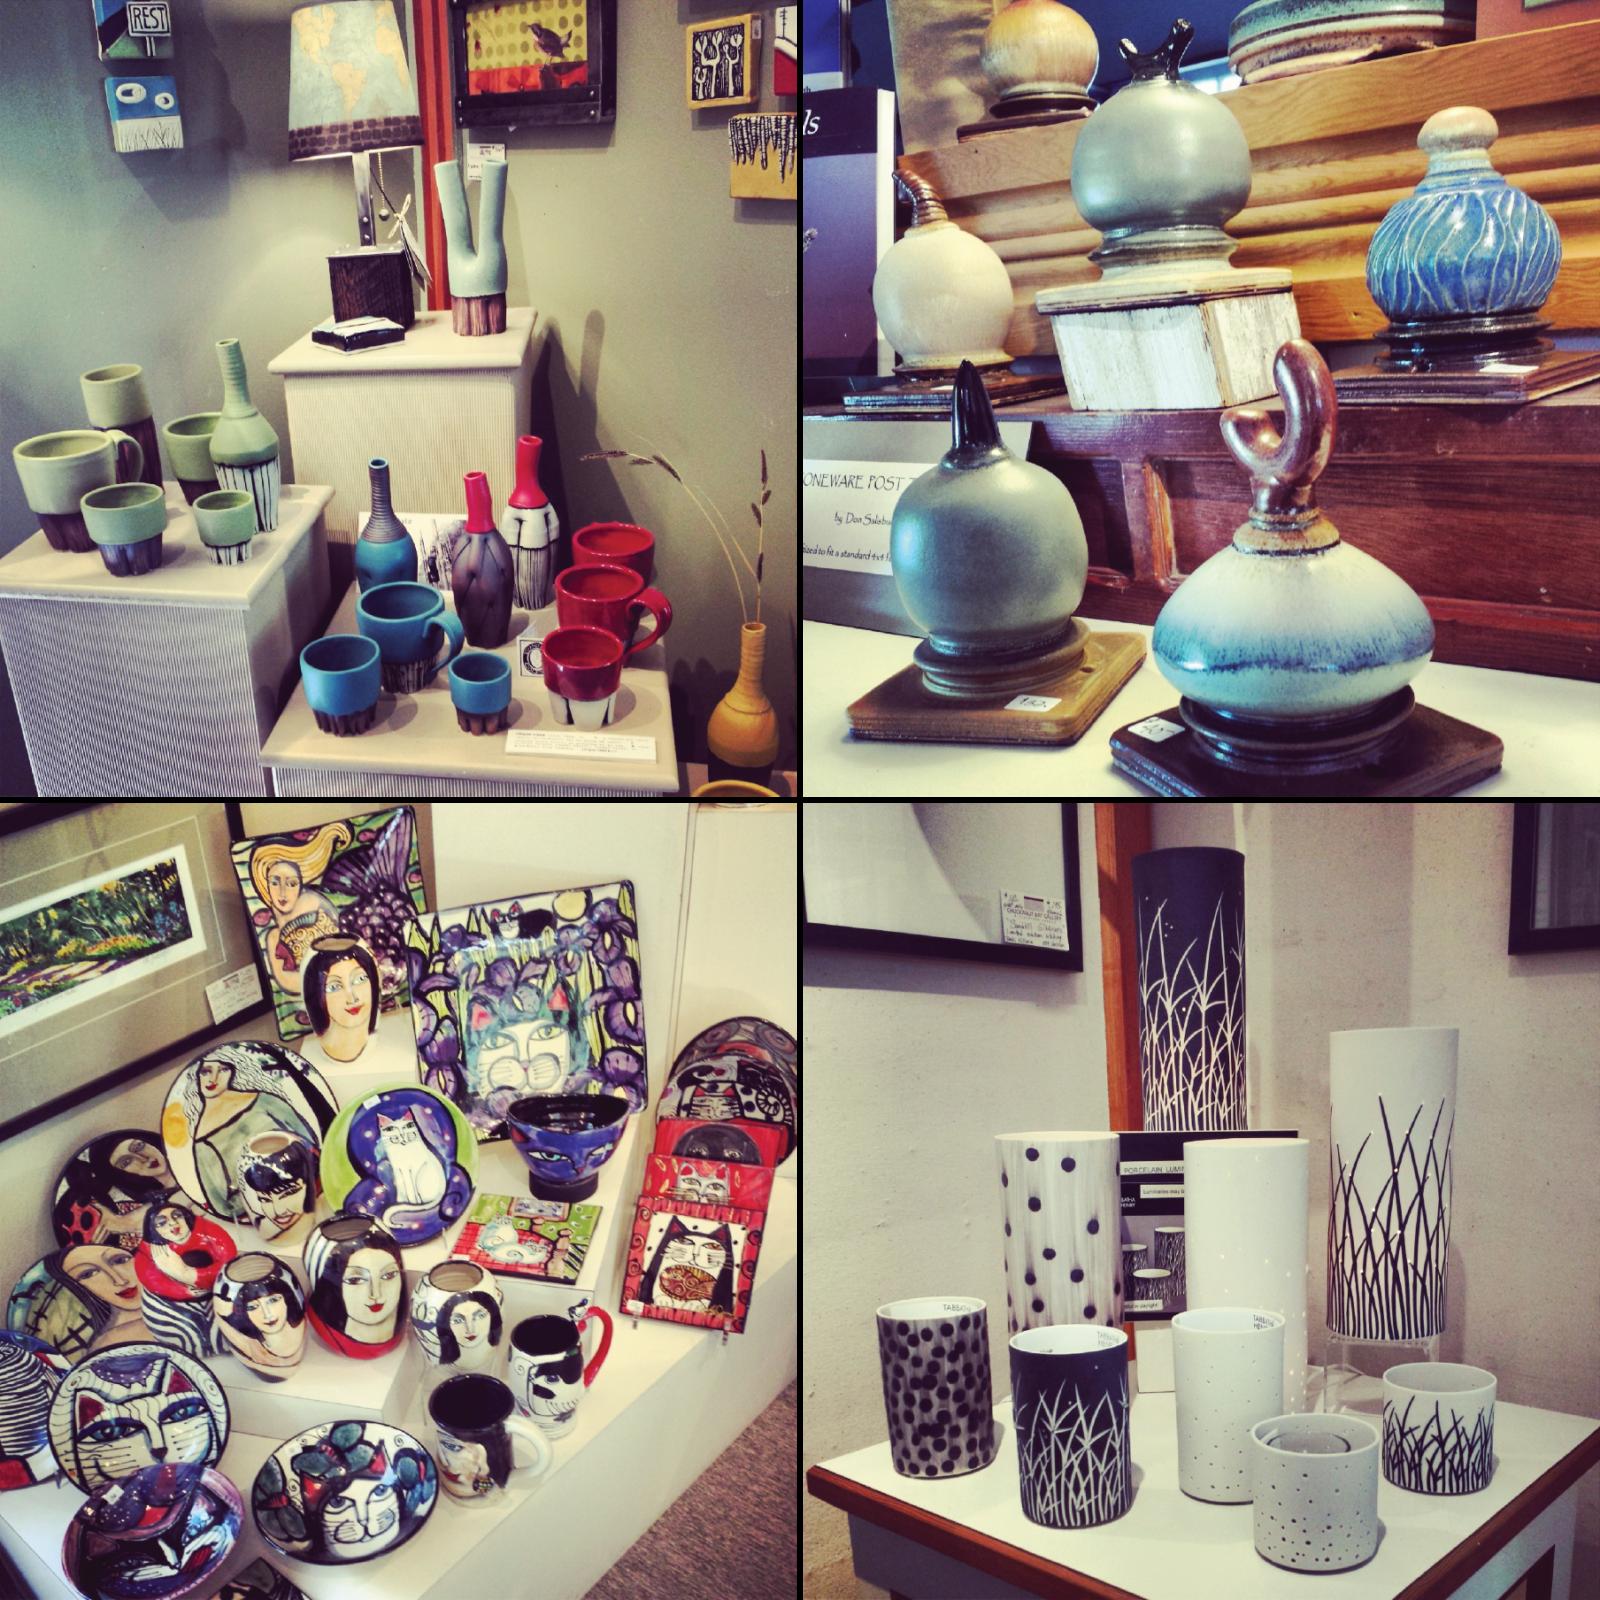 Chuckanut Bay Gallery, Bellingham, Chuckanut Drive, Art Gallery, Sculpture Garden, Pottery, Garden Art